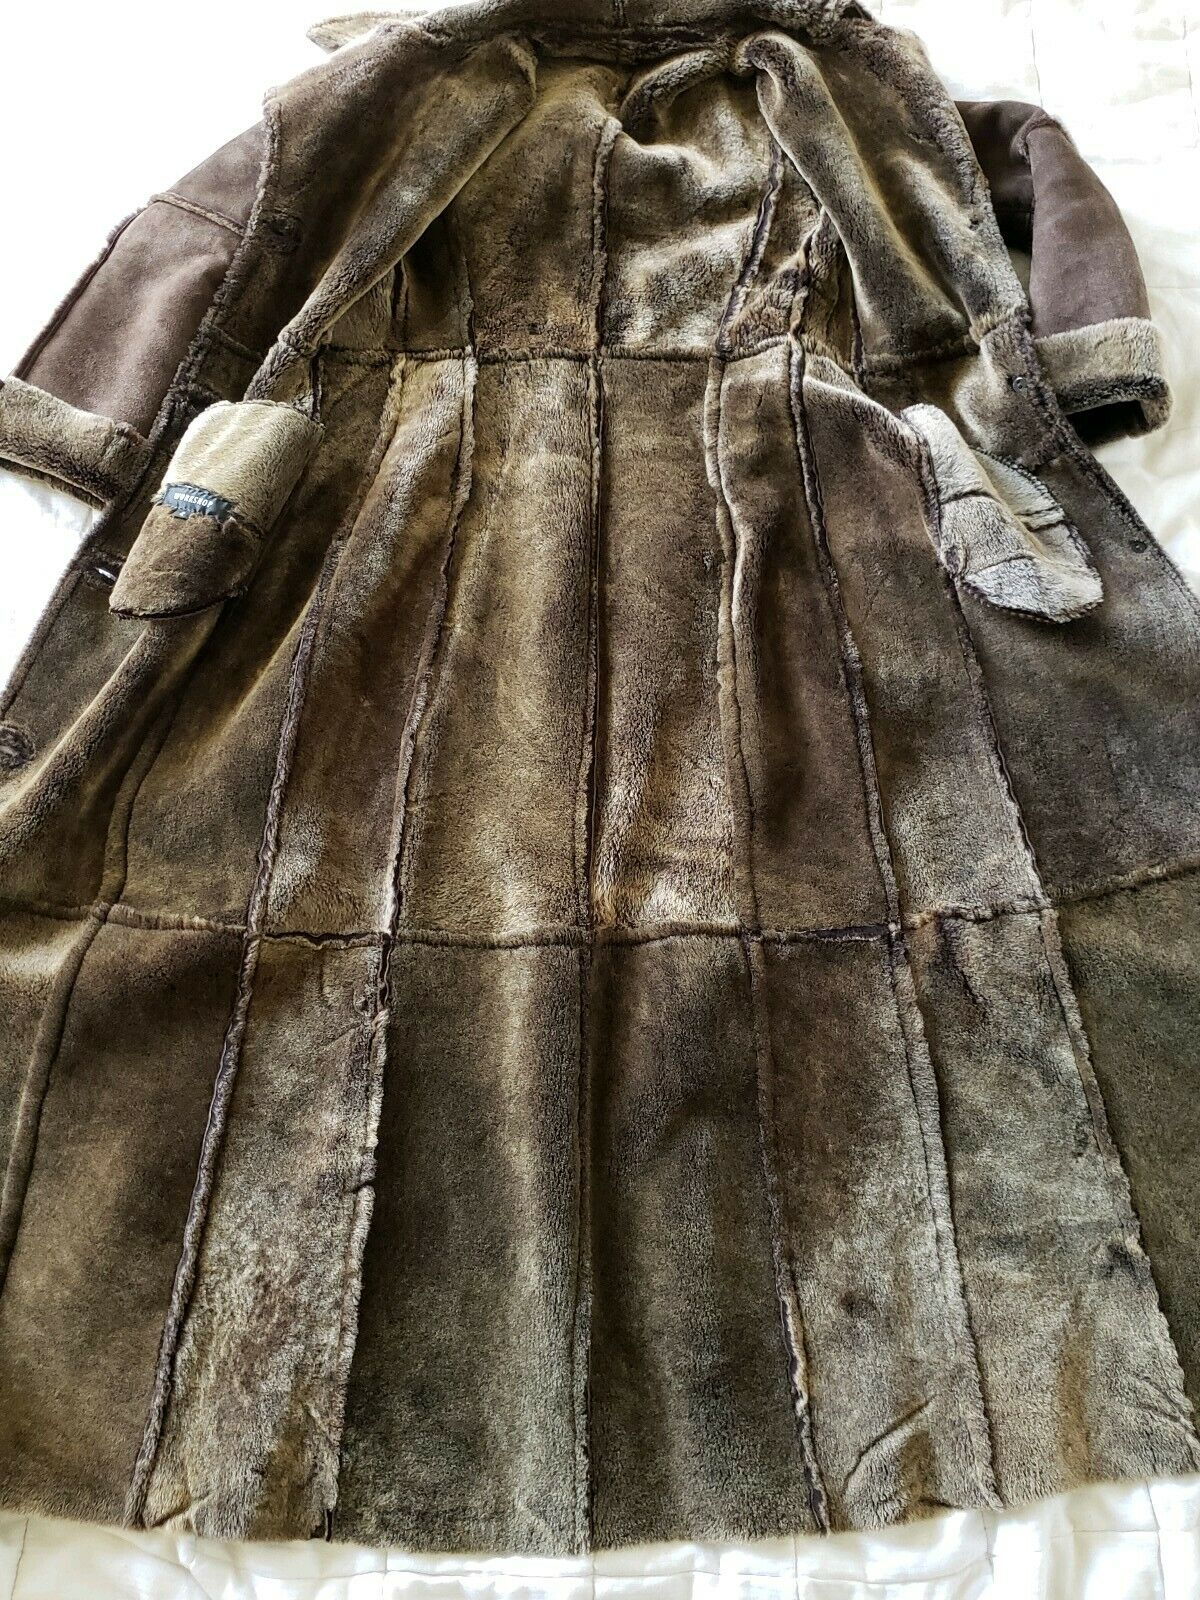 Workshop NY full length shearling coat lightweigh… - image 2